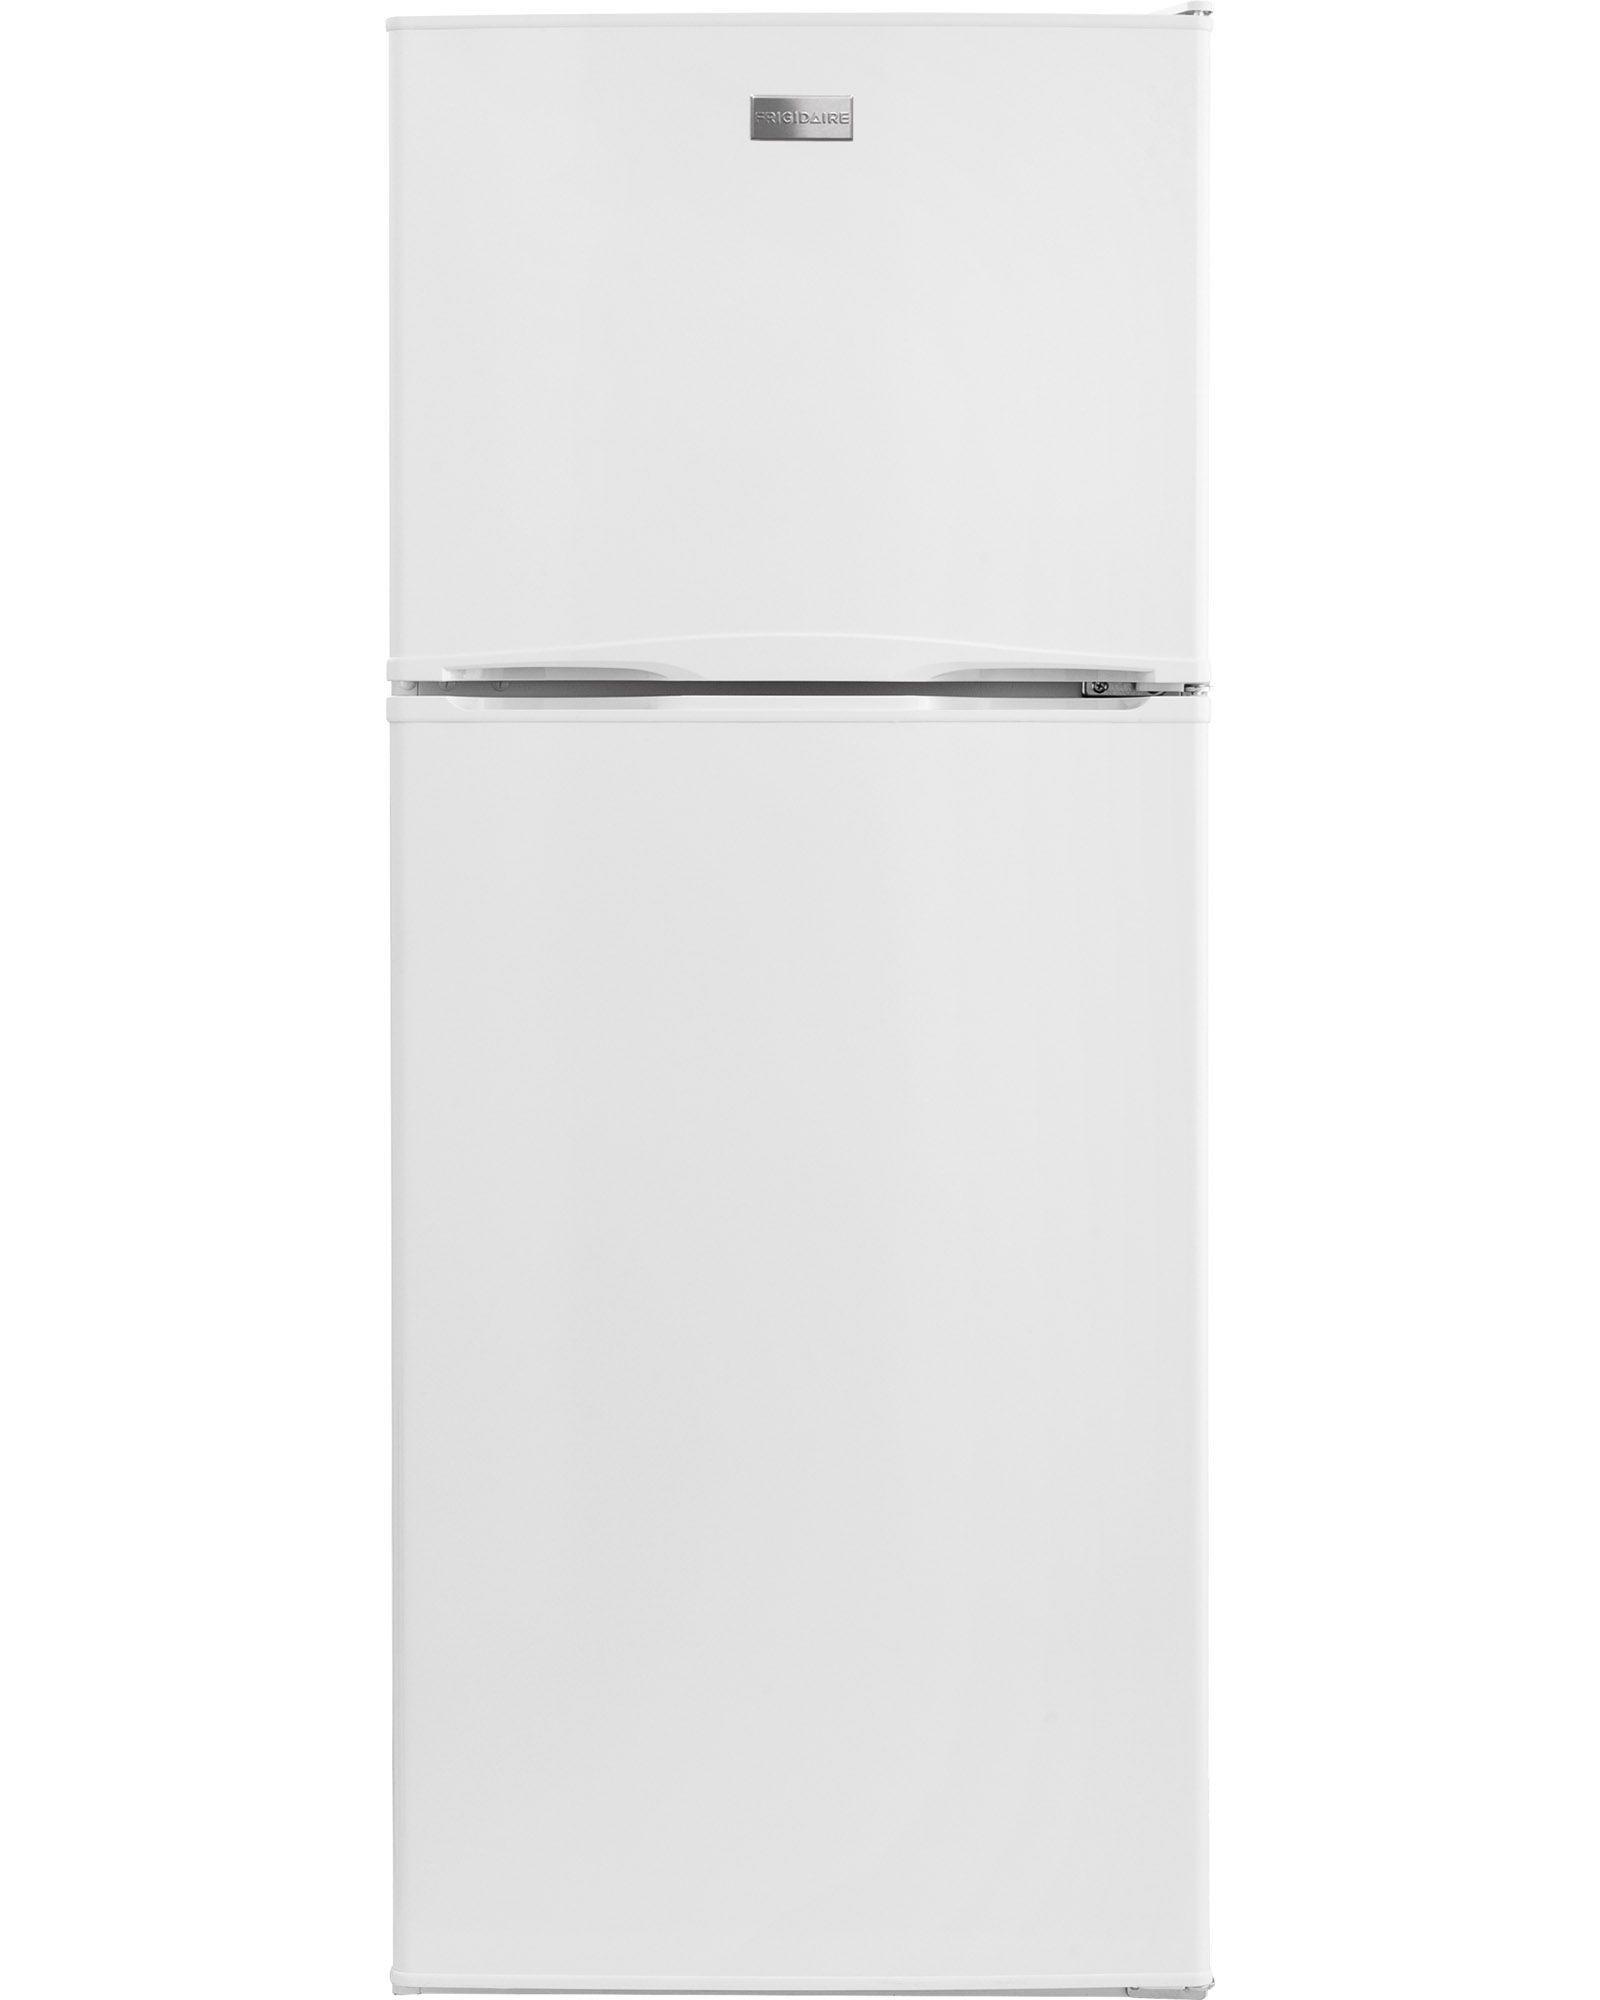 STANDARD OPTION? The Frigidaire 9.9 cu. ft. Top Freezer ...